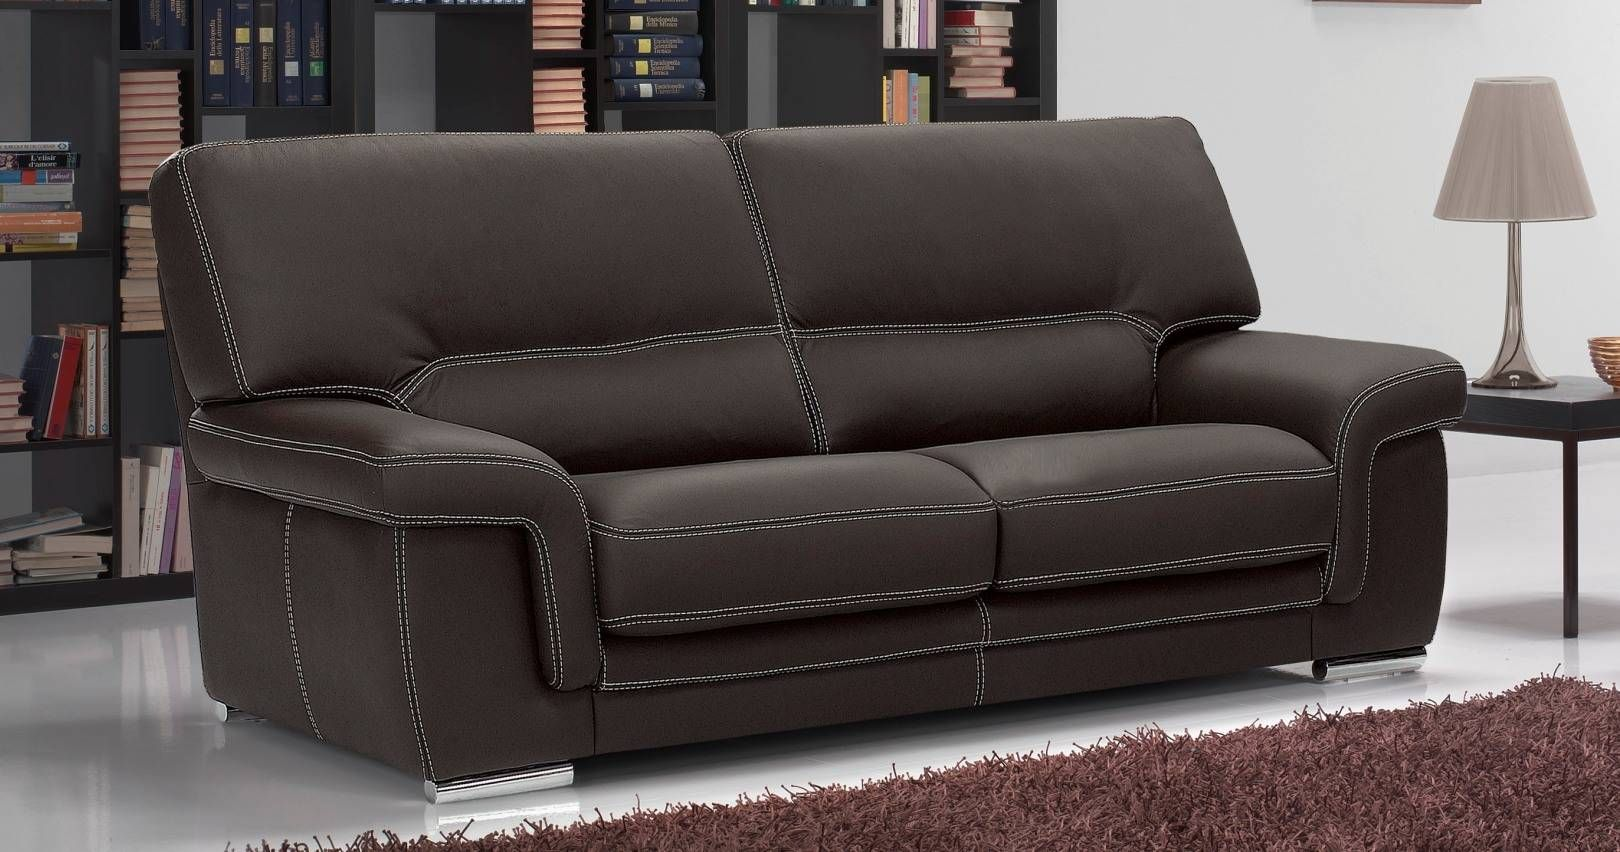 Solde Canape Conforama Canape Cuir Buffle Solde Maison Design